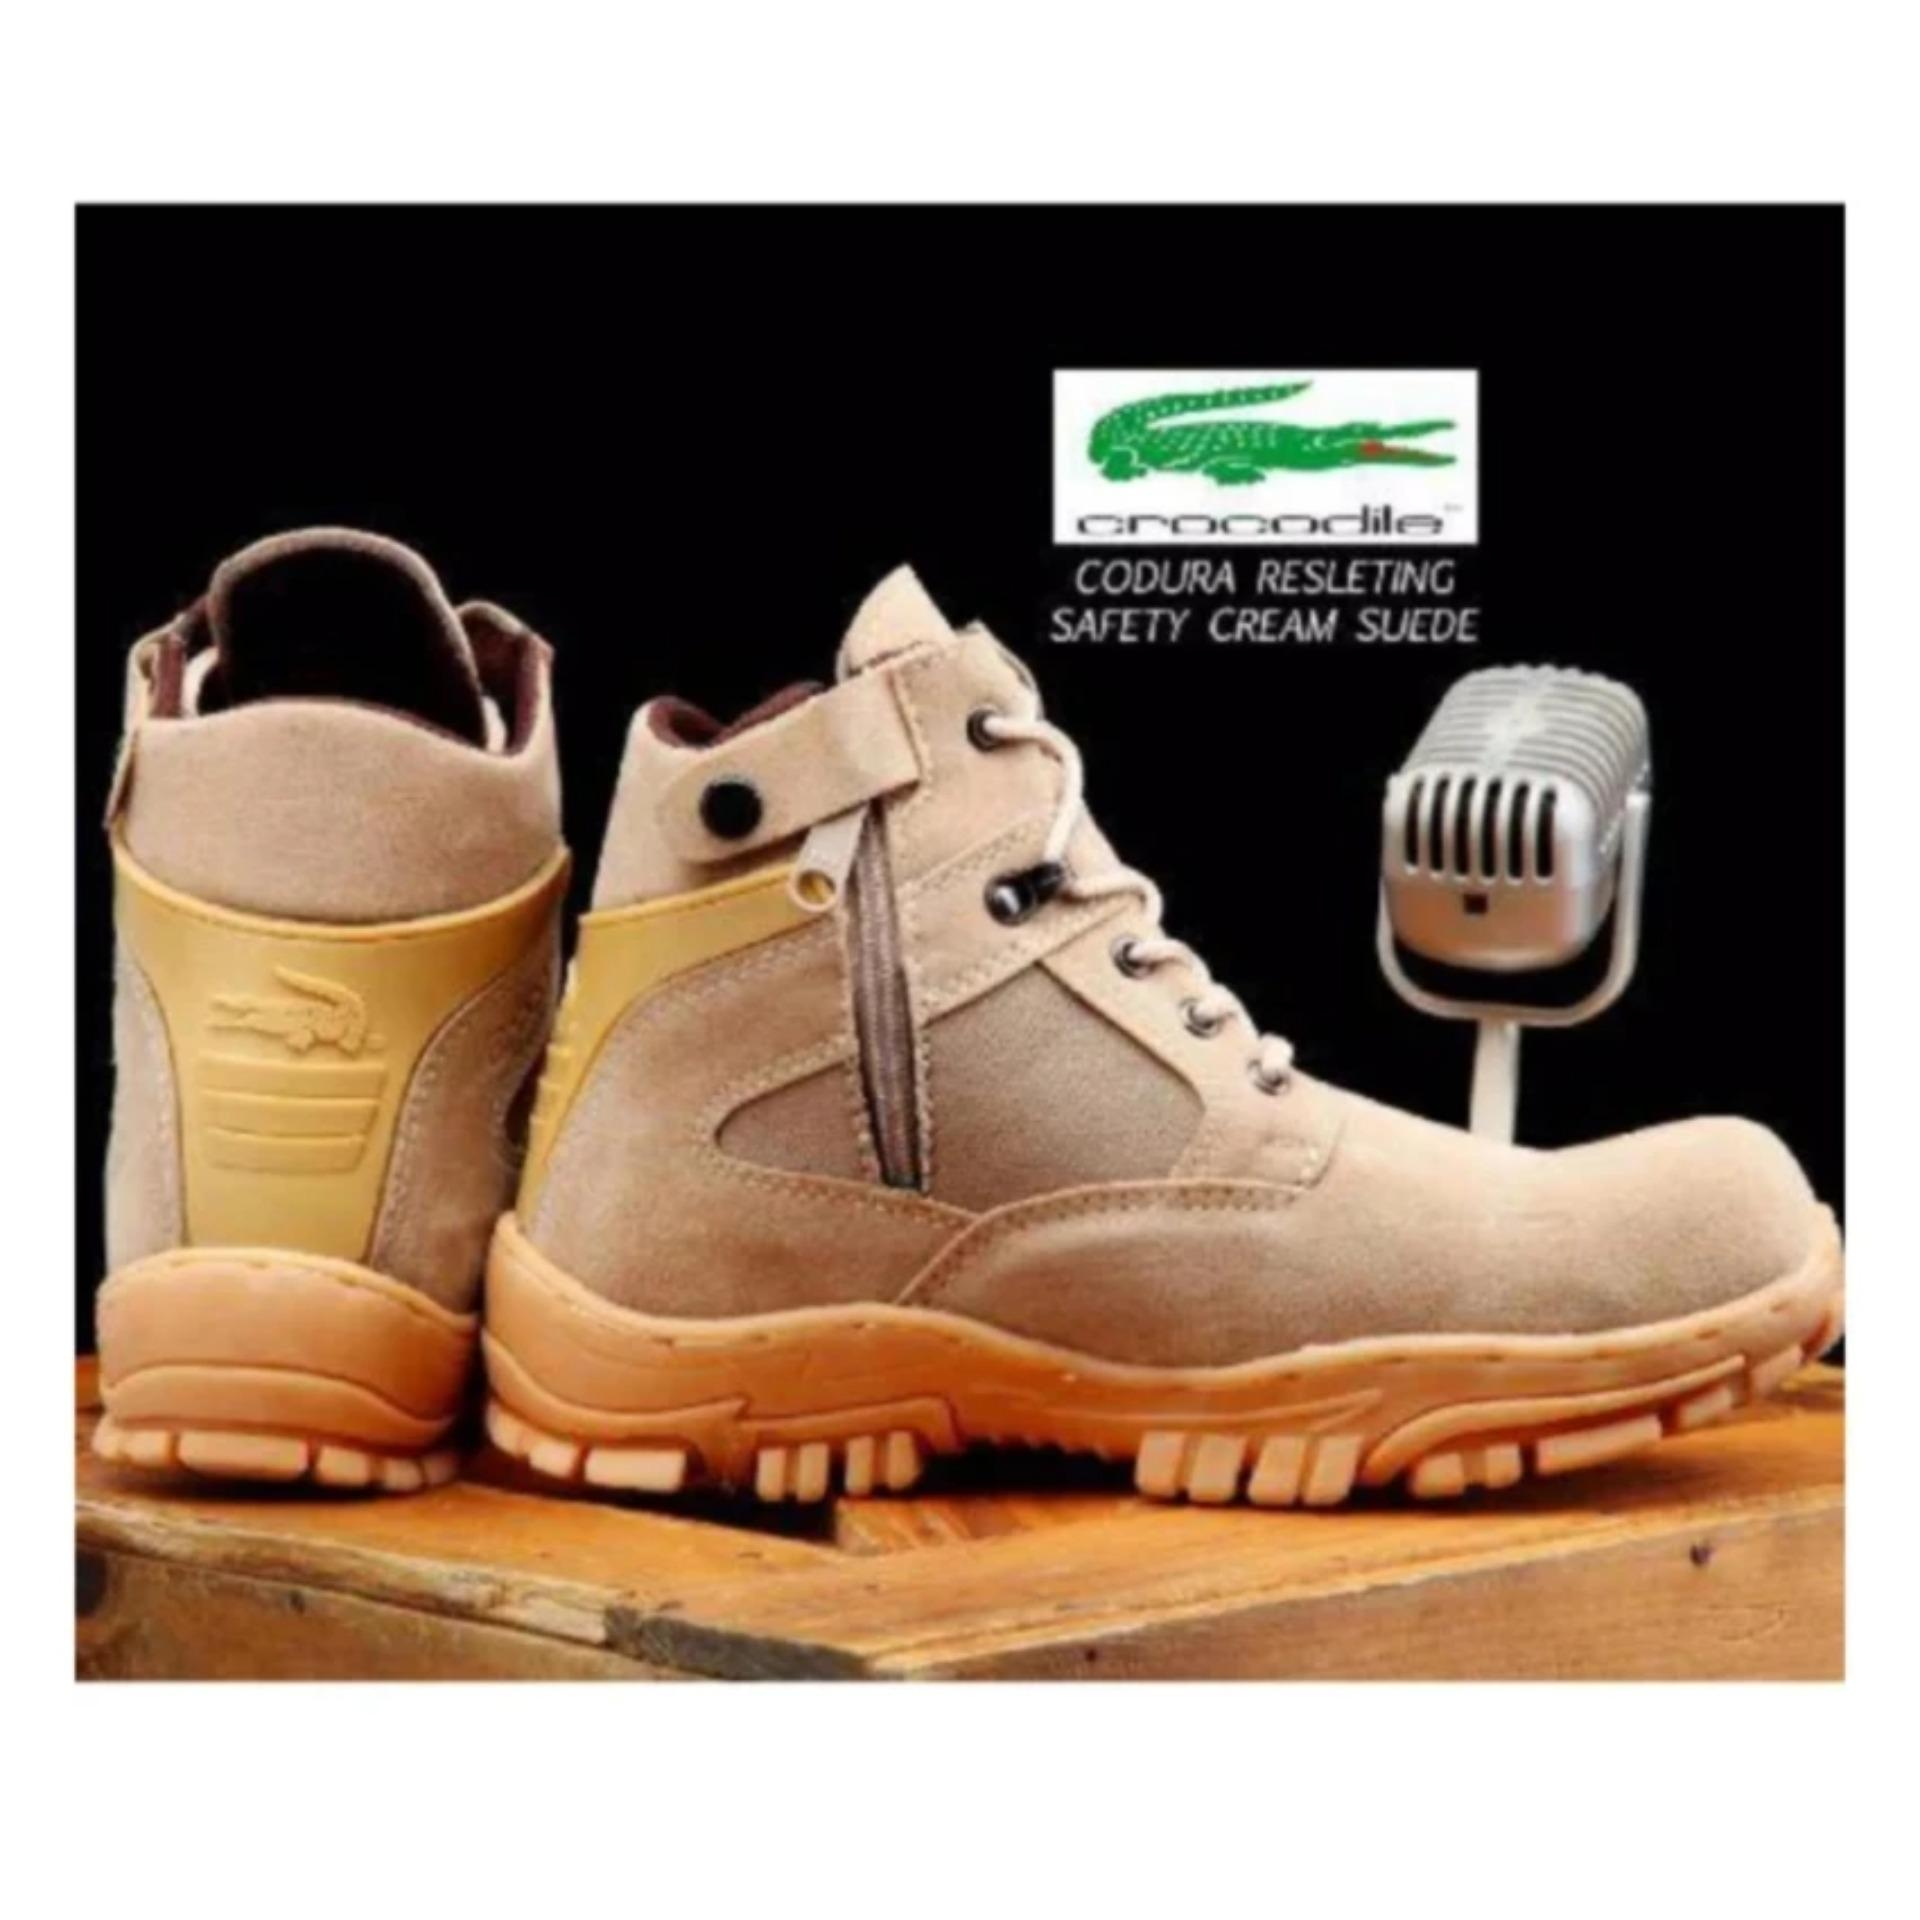 Sepatu Pria Boots Safety Crocodile Cordura Resleting Ujung Besi - Cream  Tulis ulasan untuk produk ini a86d5a5aad